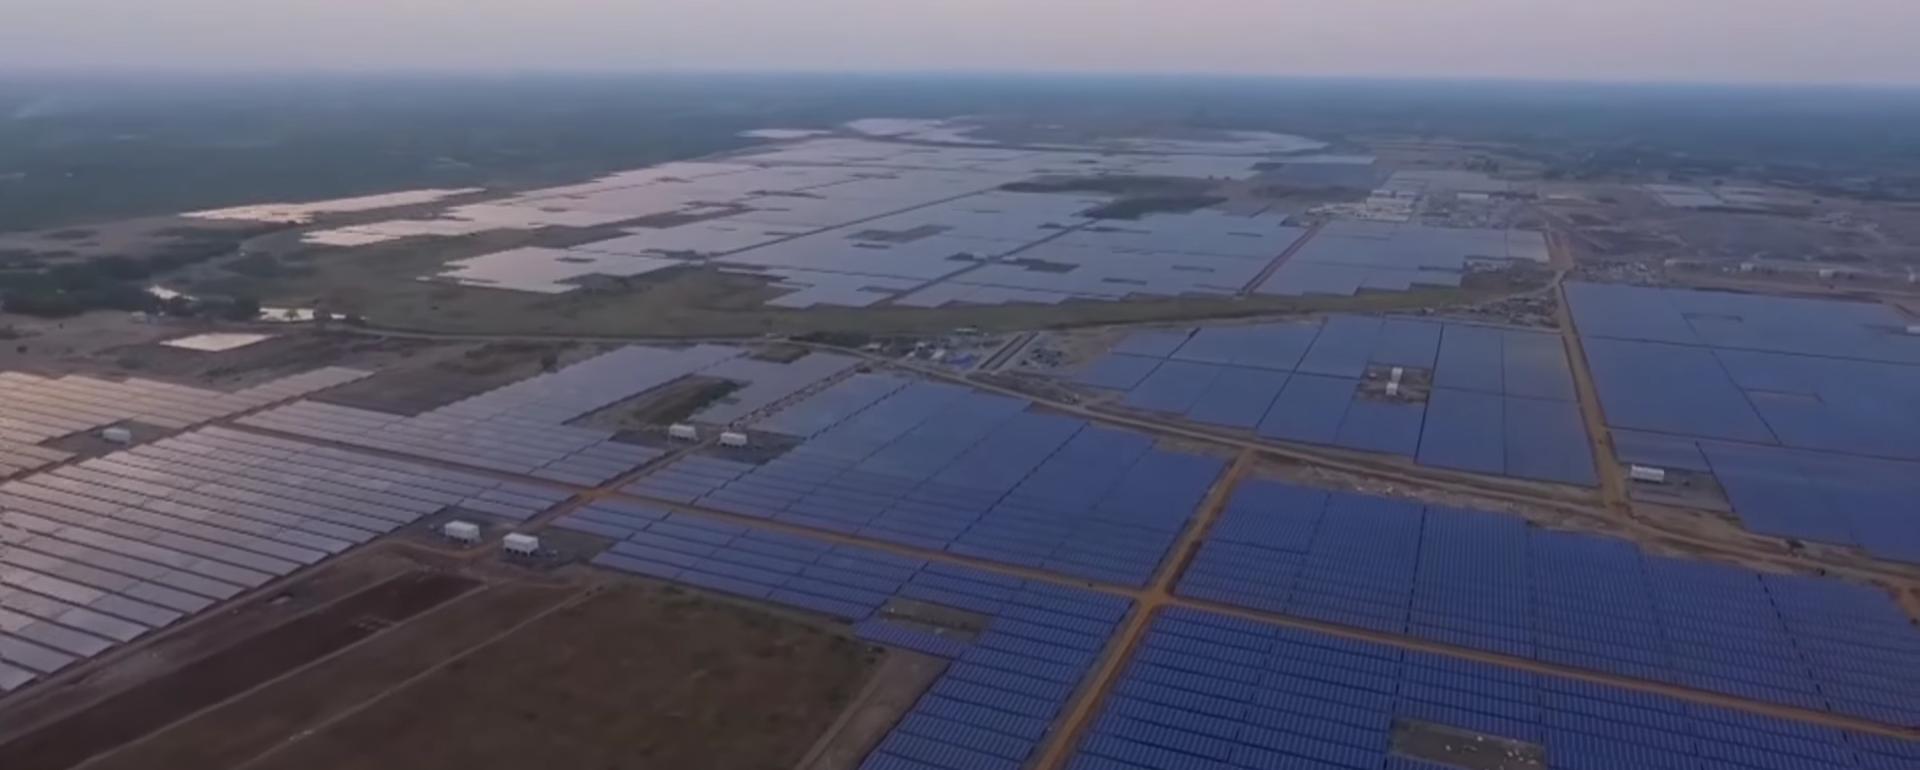 india-largest-solar-farm